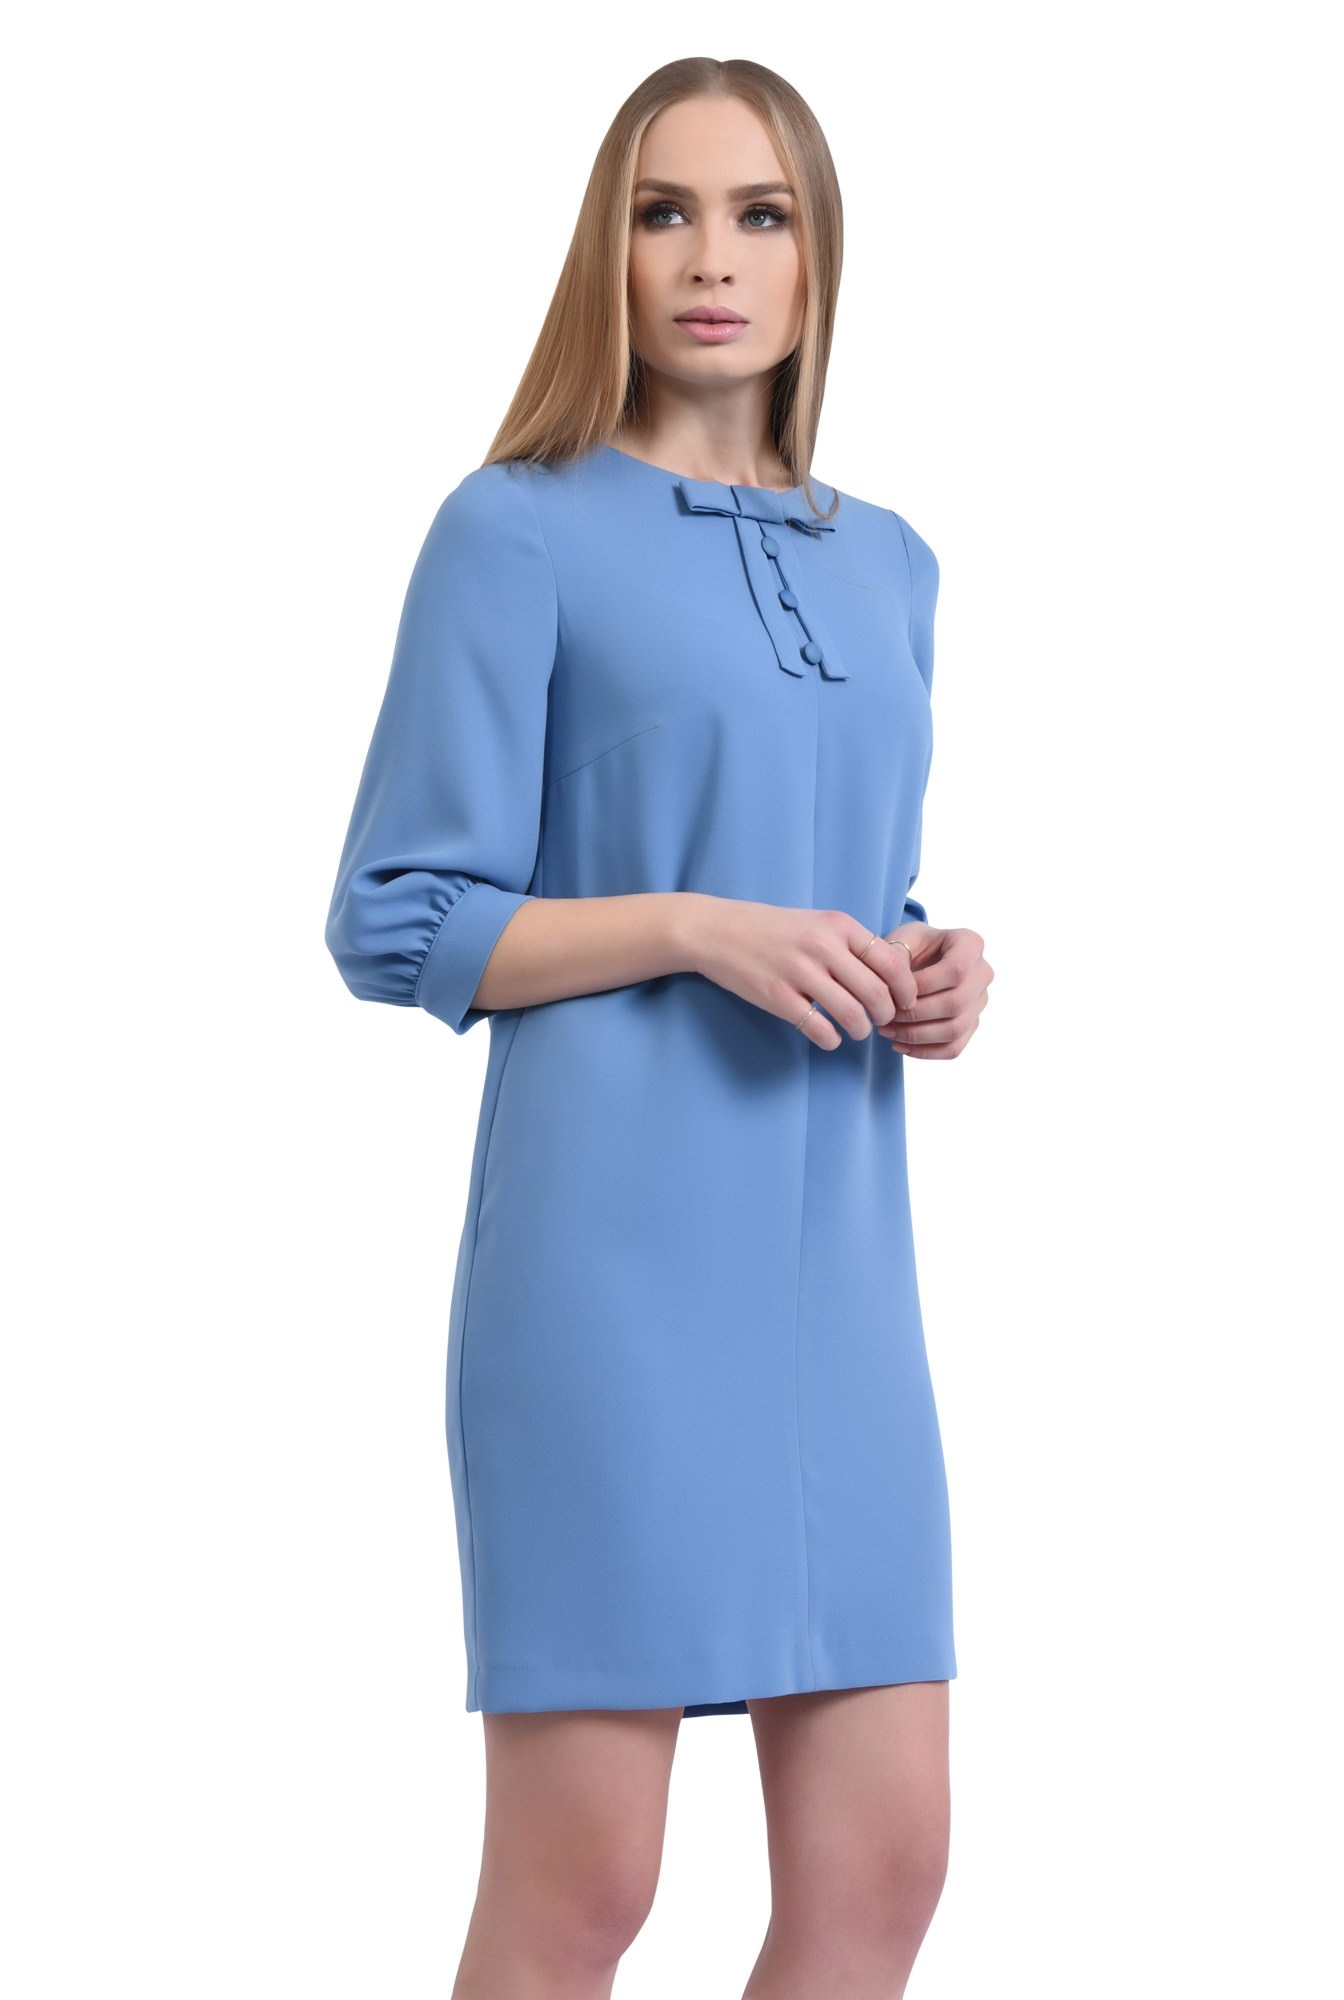 0 - Rochie casual, bleu